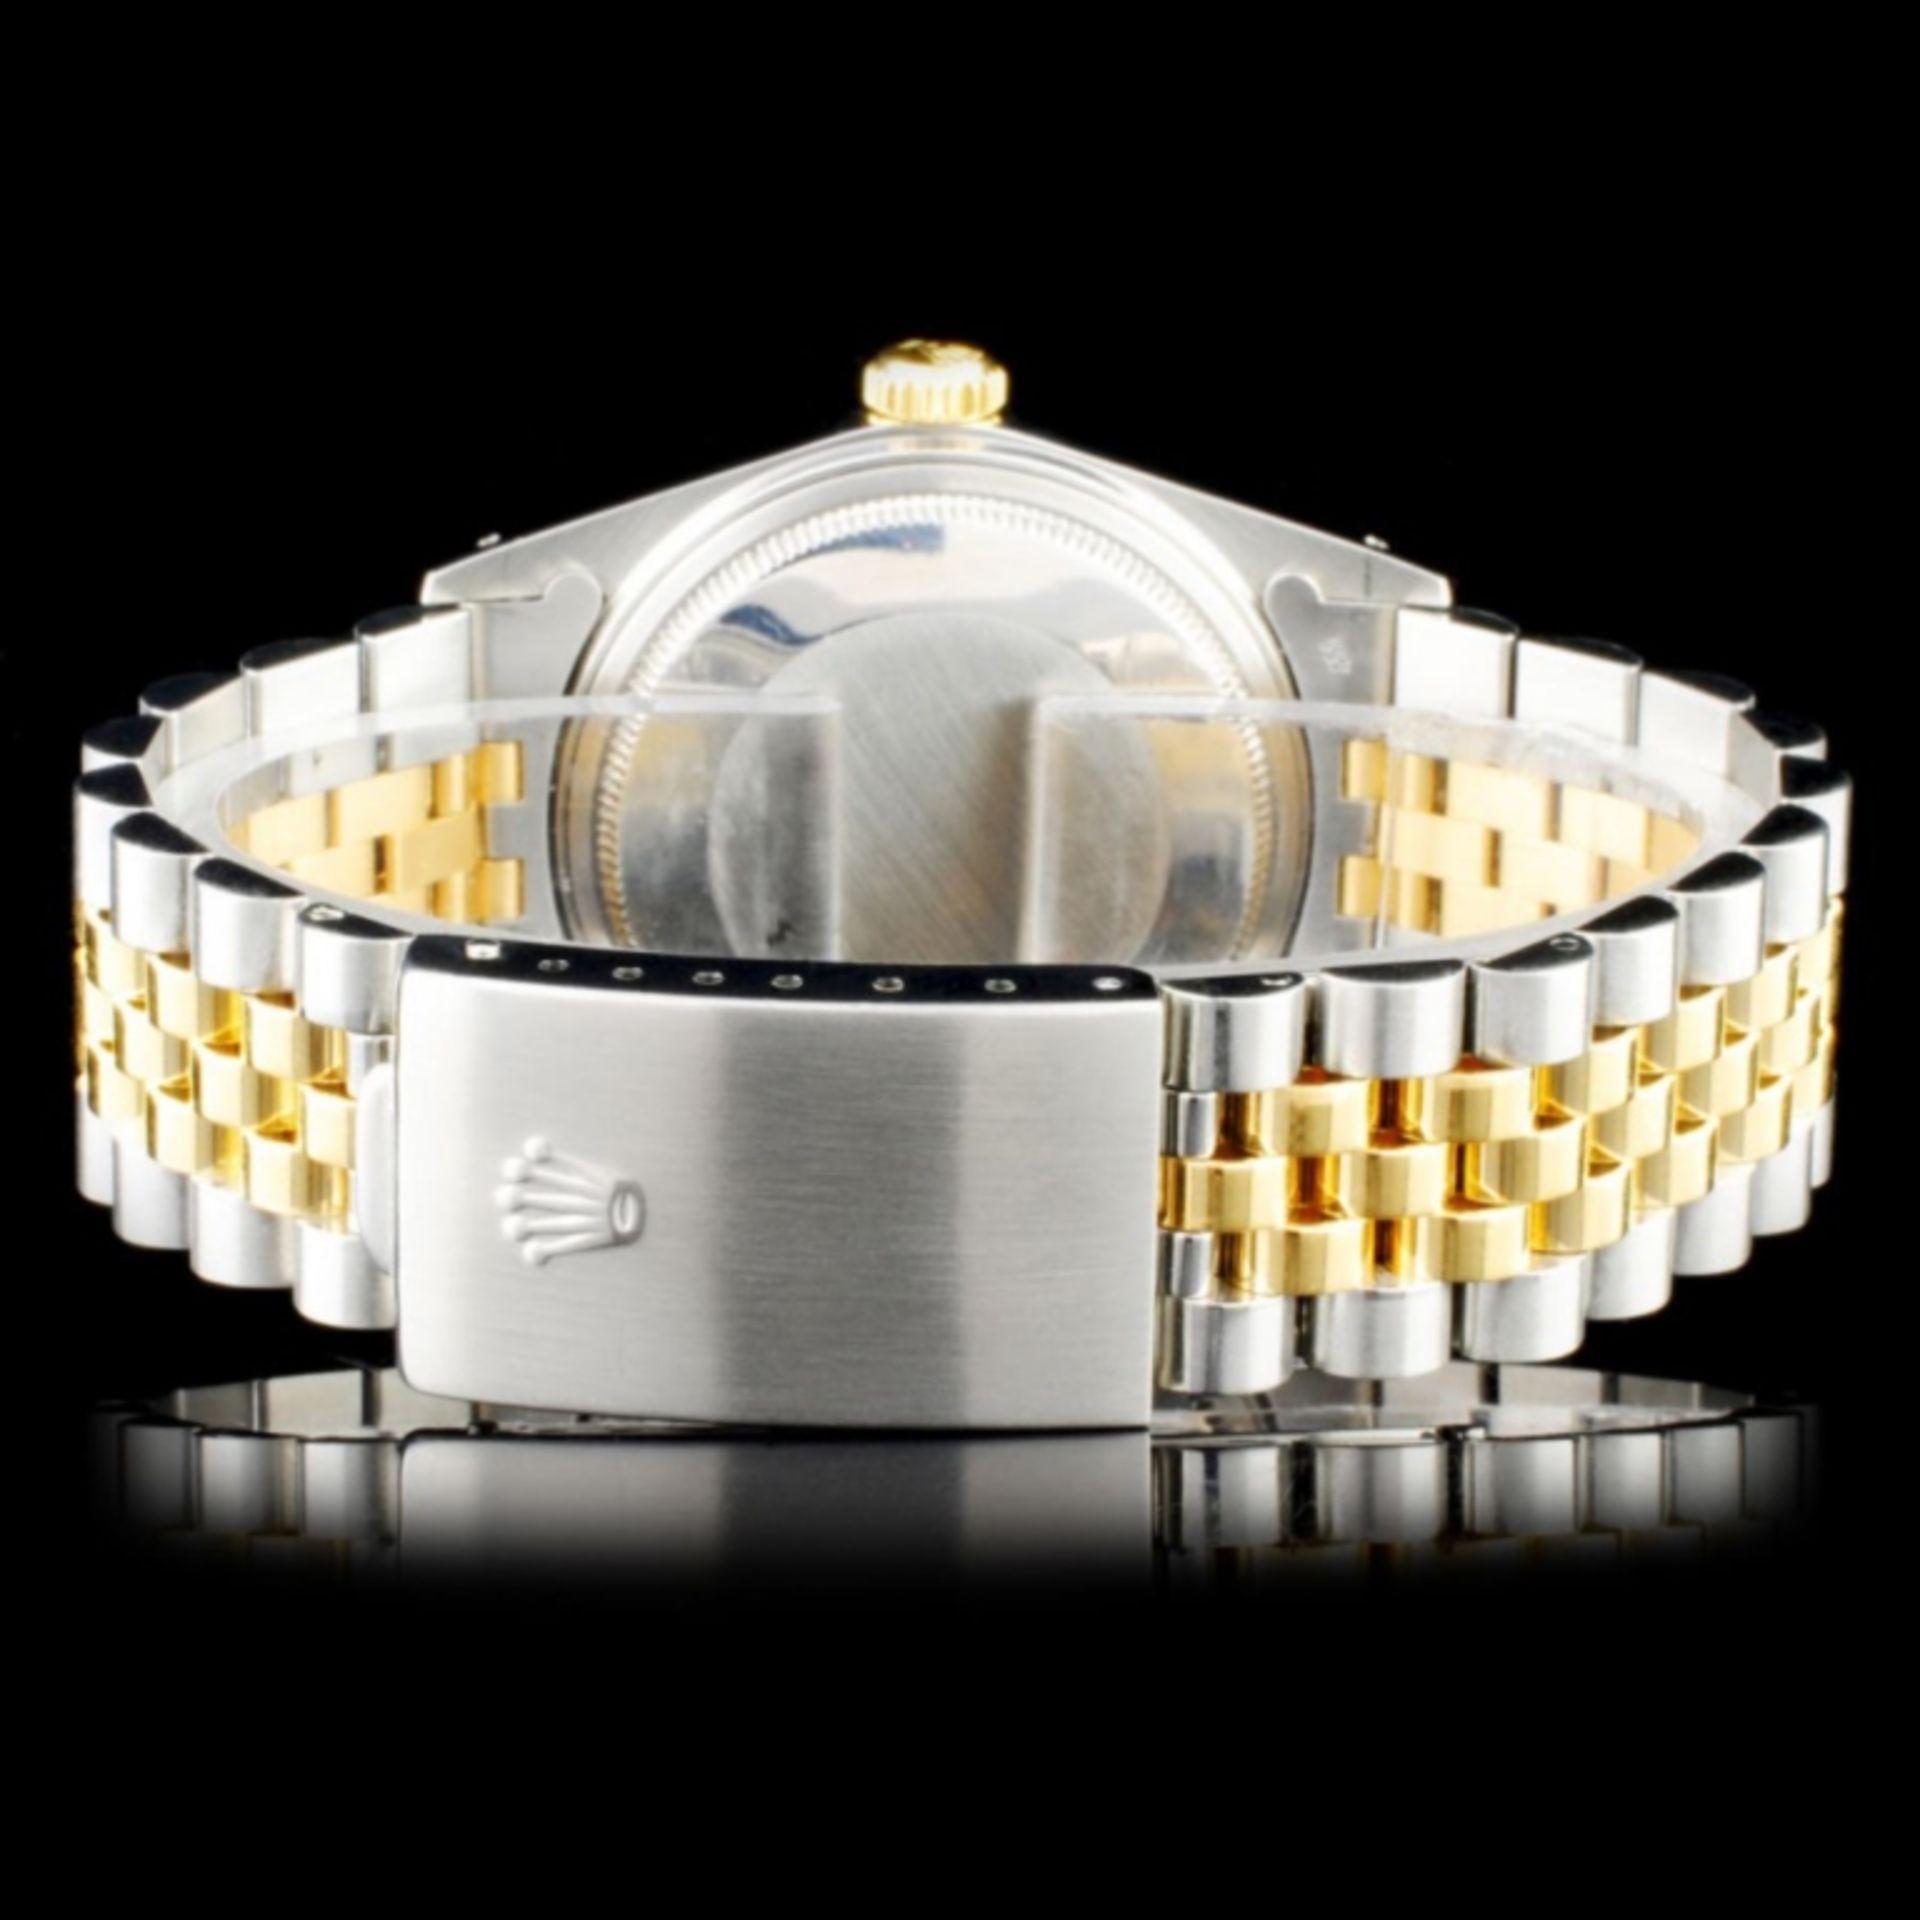 Rolex YG/SS 36MM DateJust Diamond Watch - Image 3 of 5